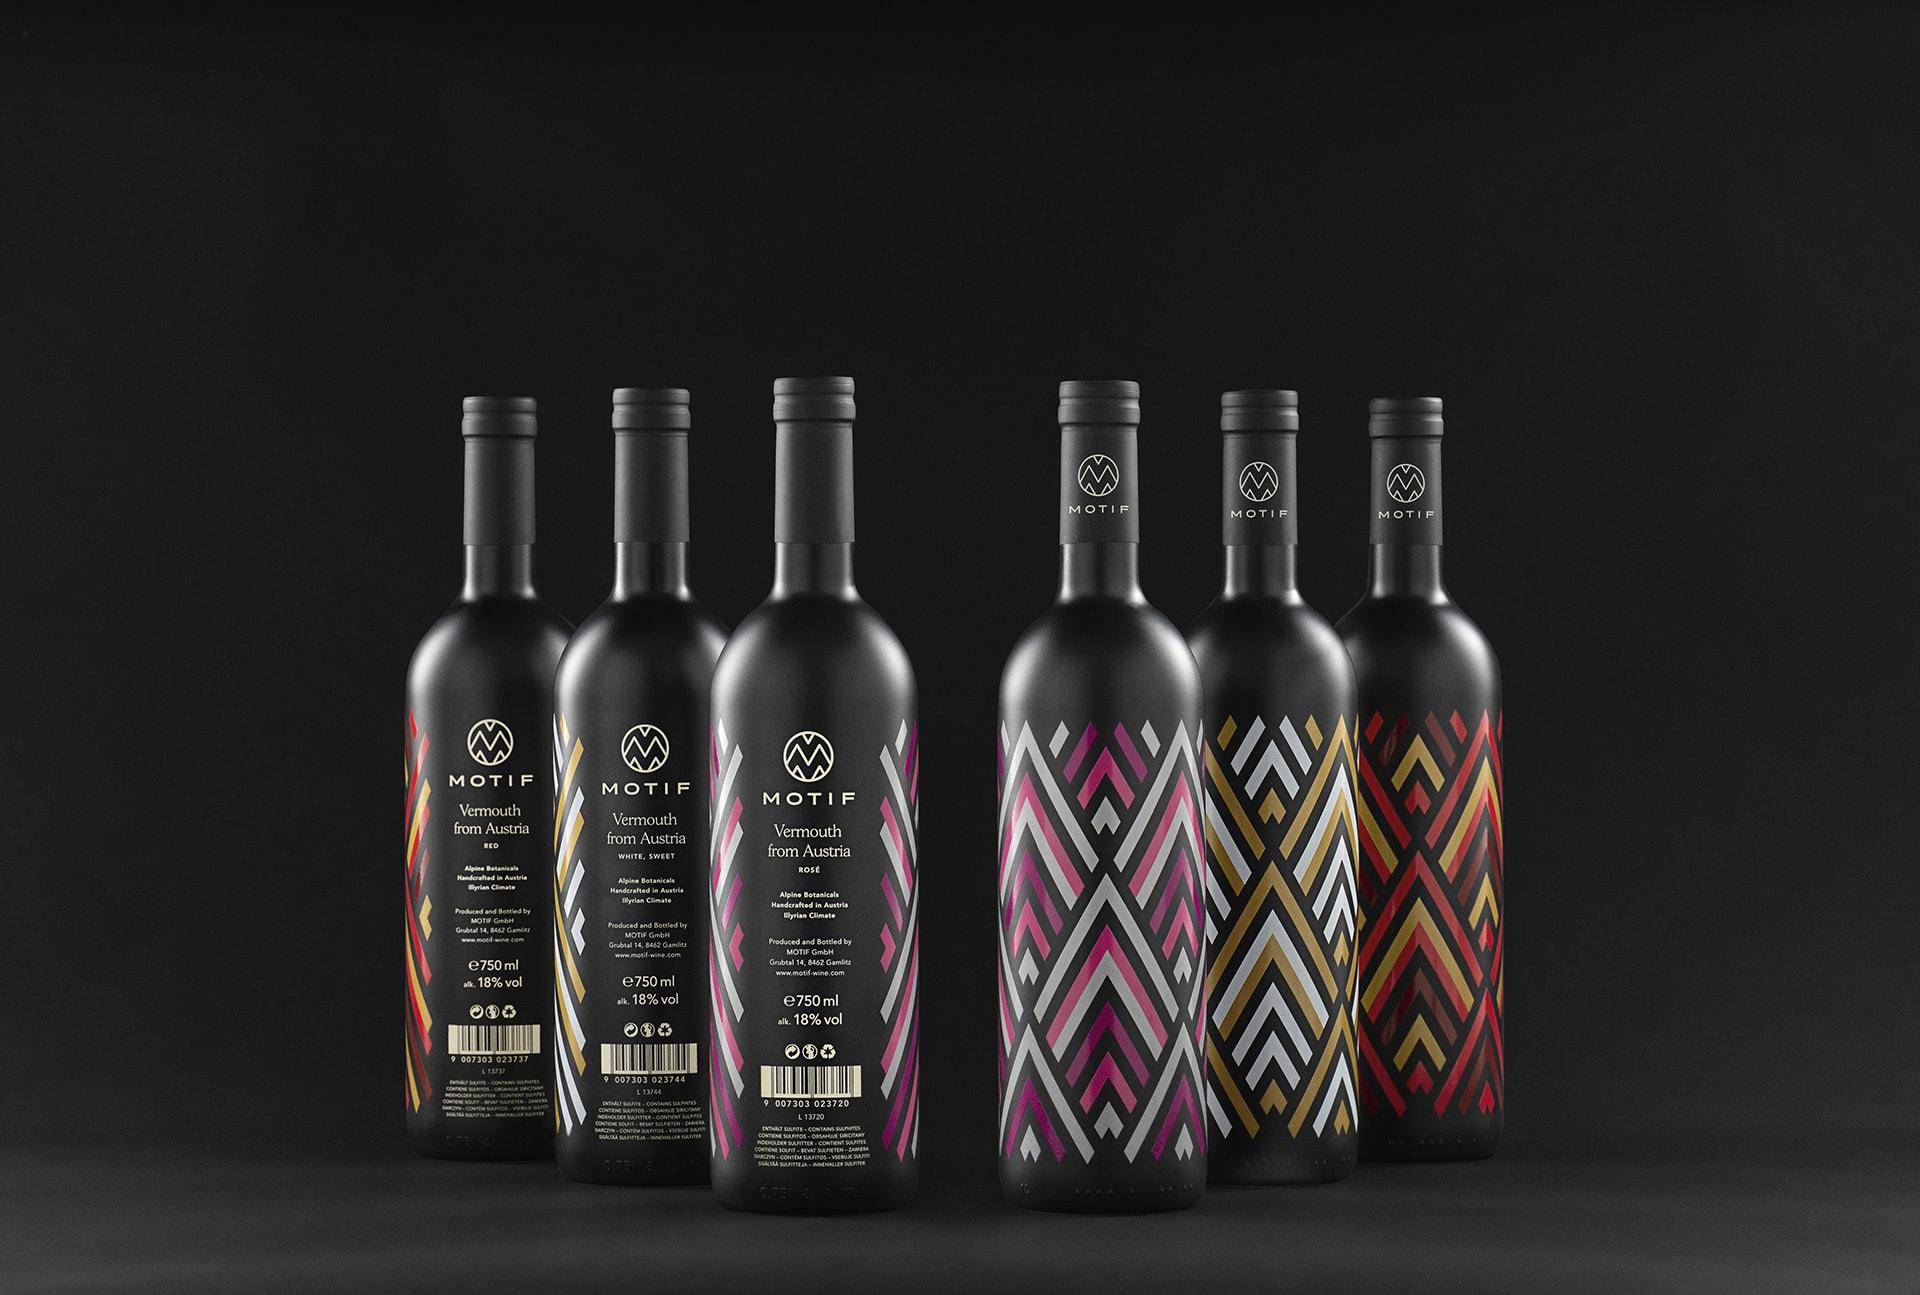 Motif Wein Branding